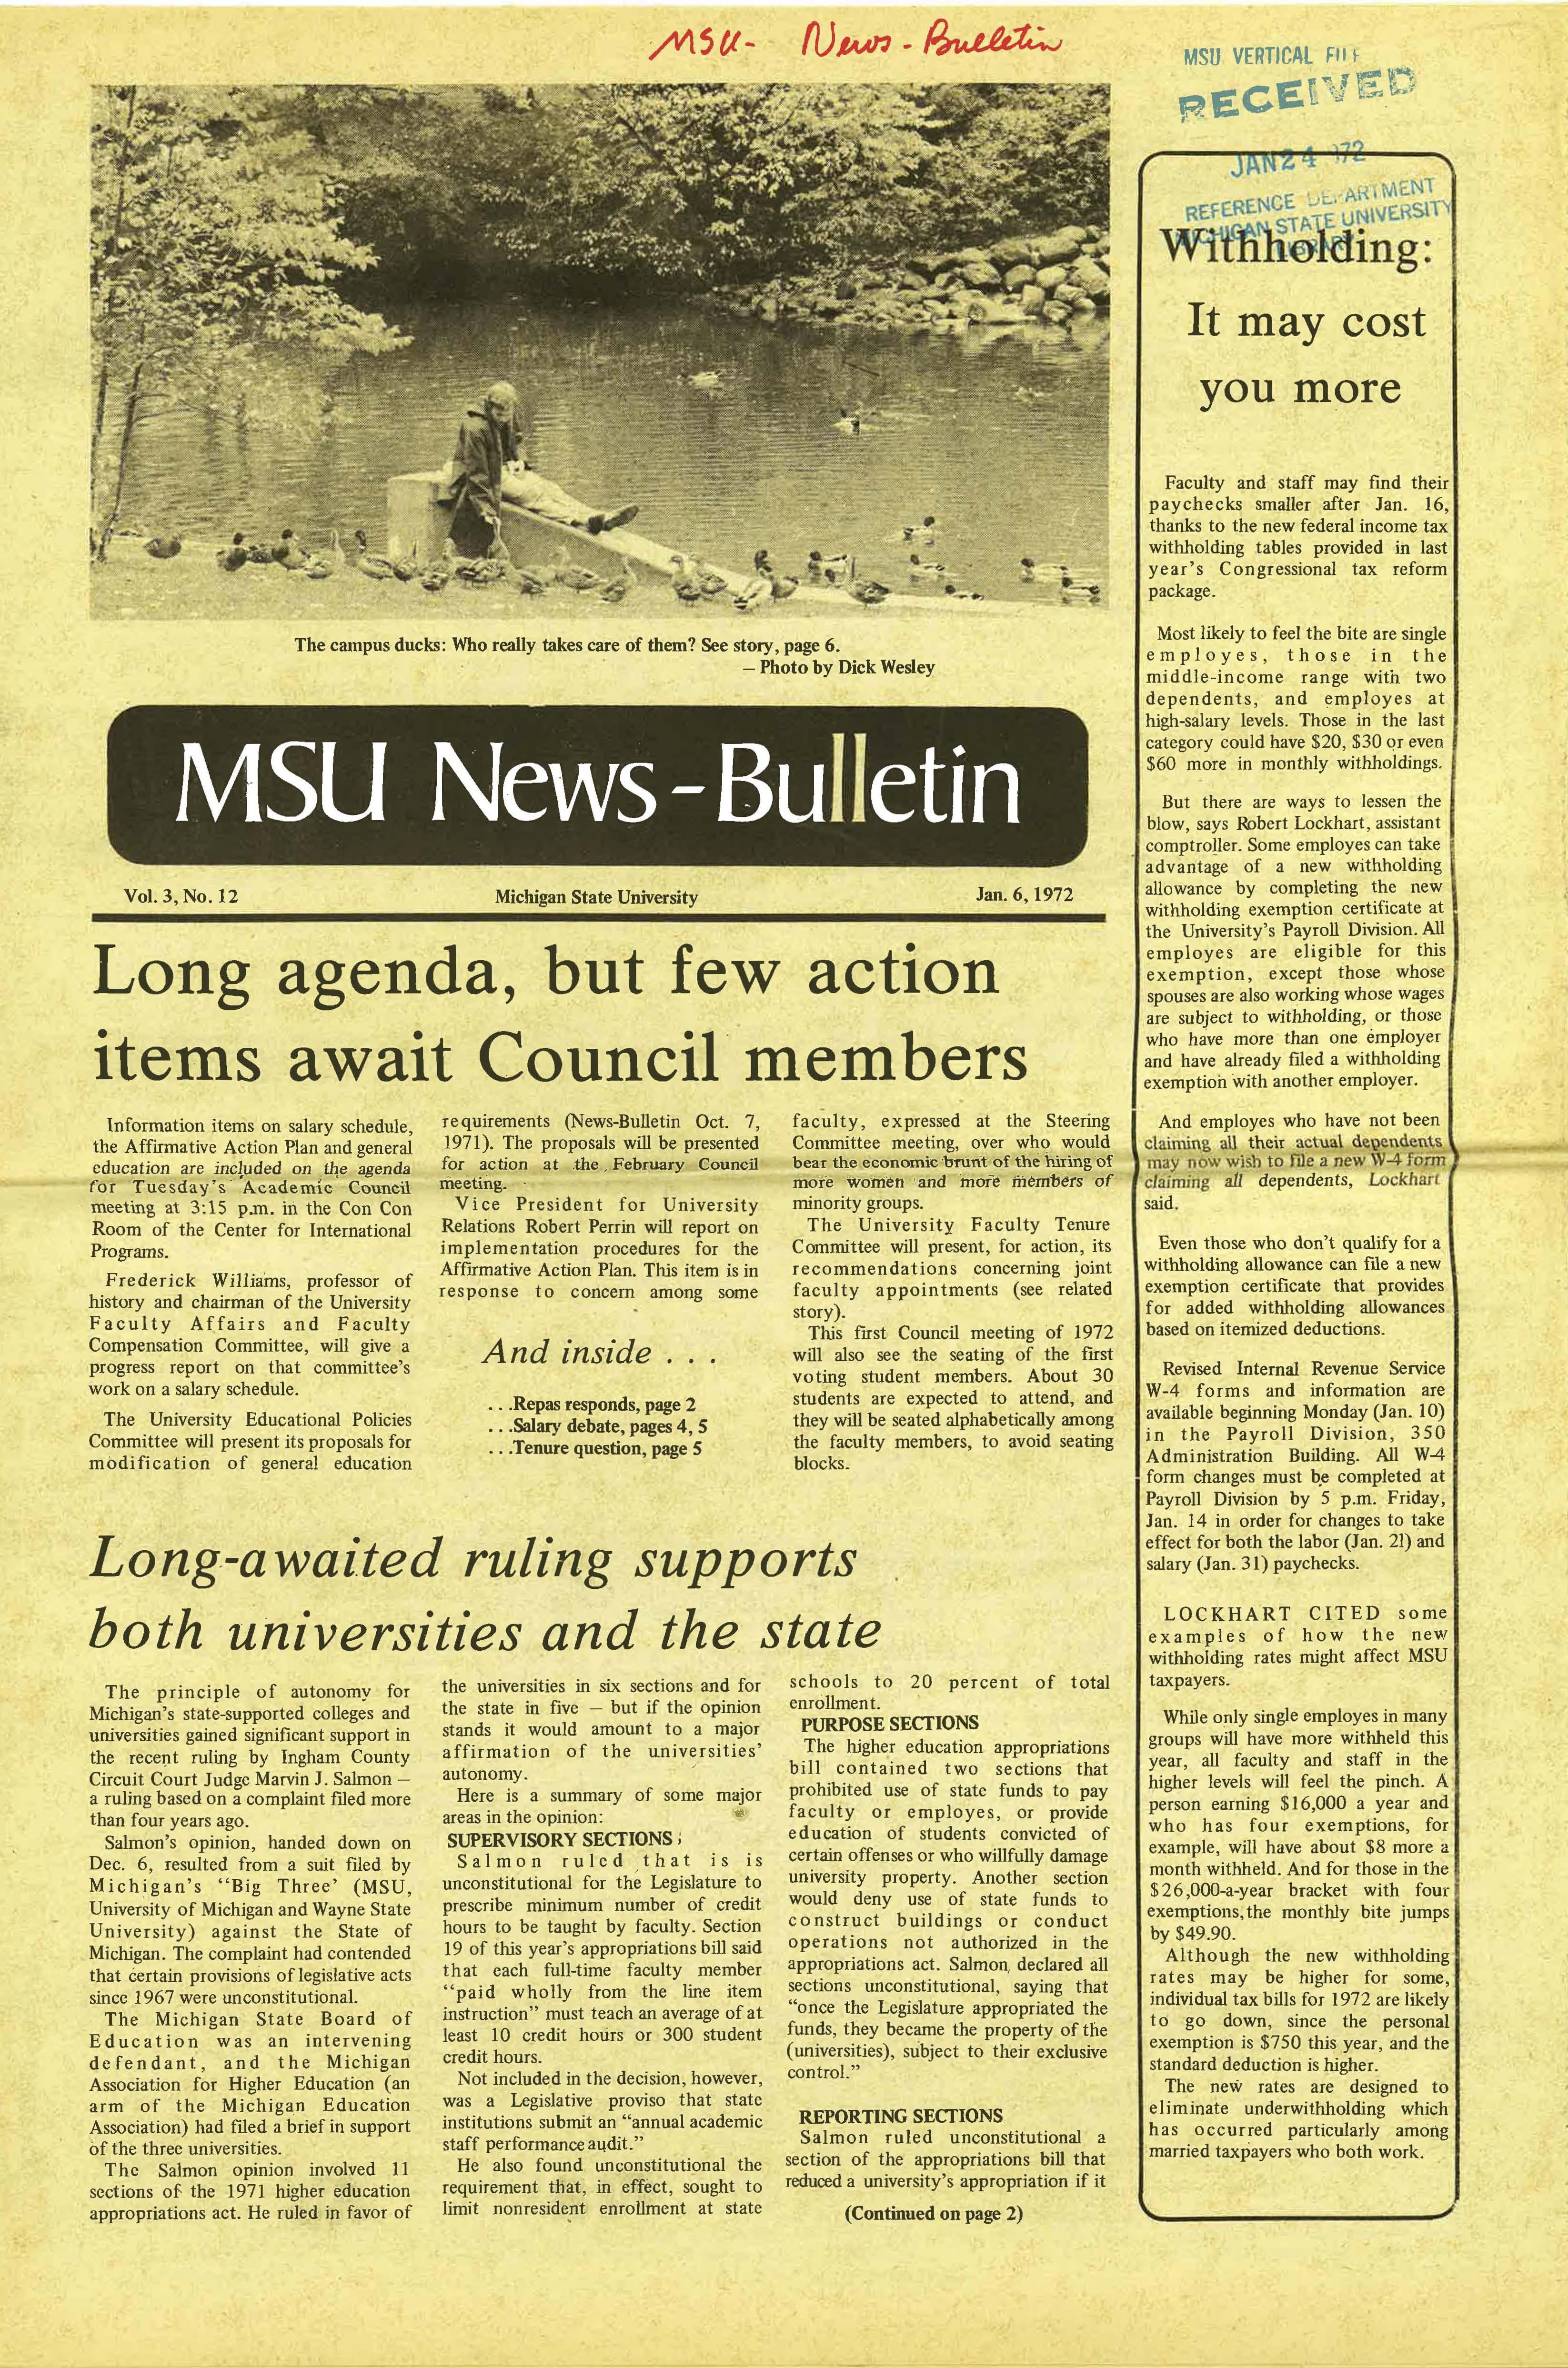 MSU News Bulletin, vol. 3, No. 37, August 24, 1972